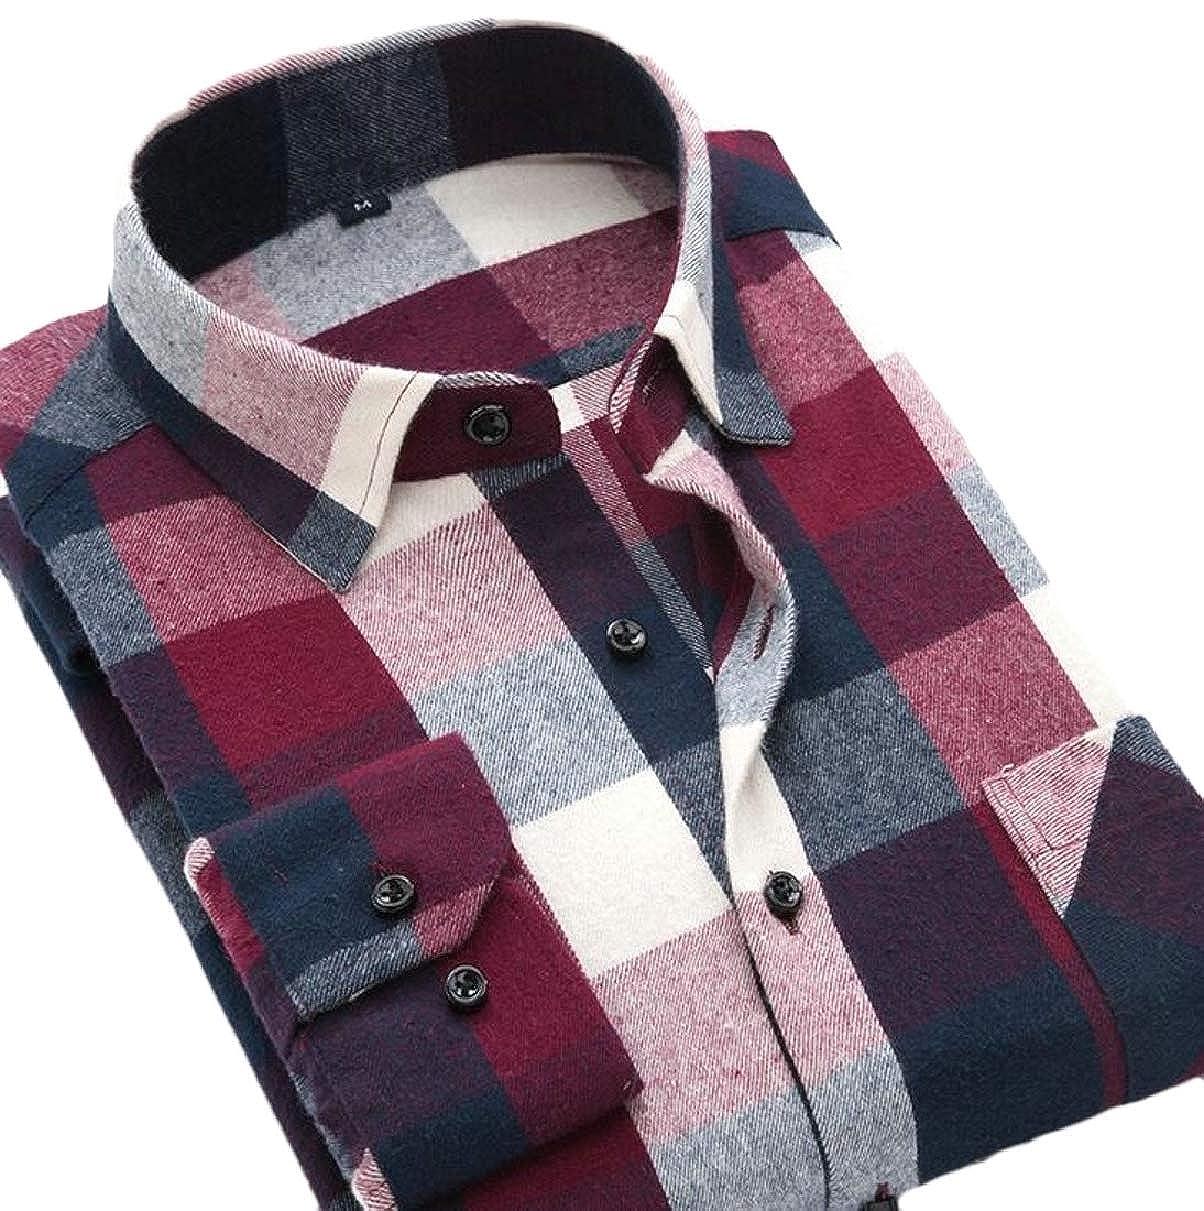 ZXFHZS Mens Long Sleeve Western Plaid Shirt Button Down Shirt